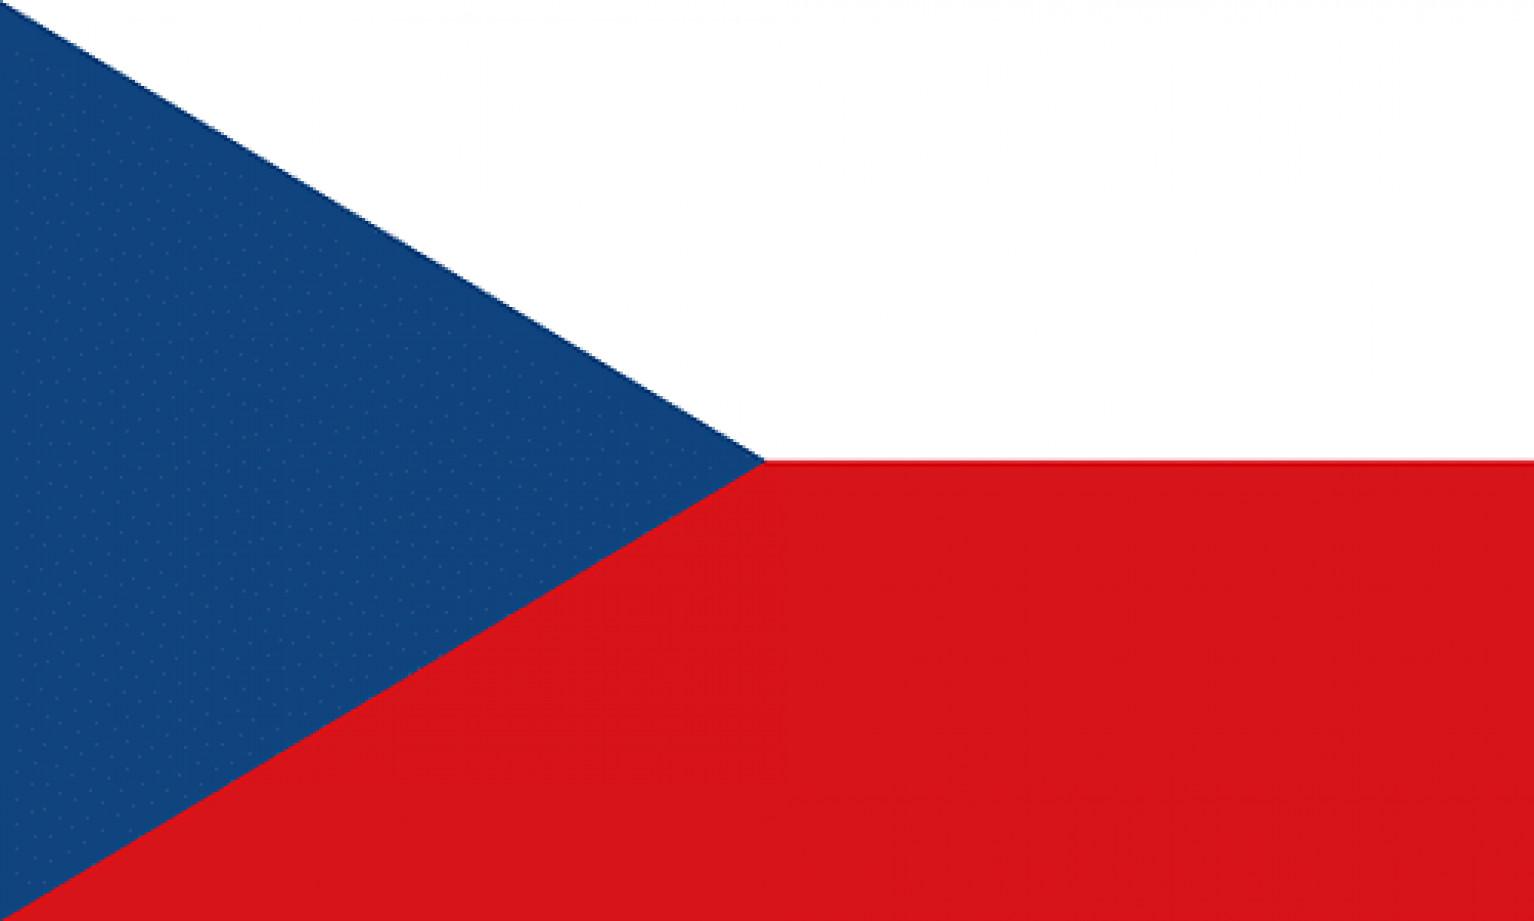 Czechia Peer-to-Peer Lending platforms and market